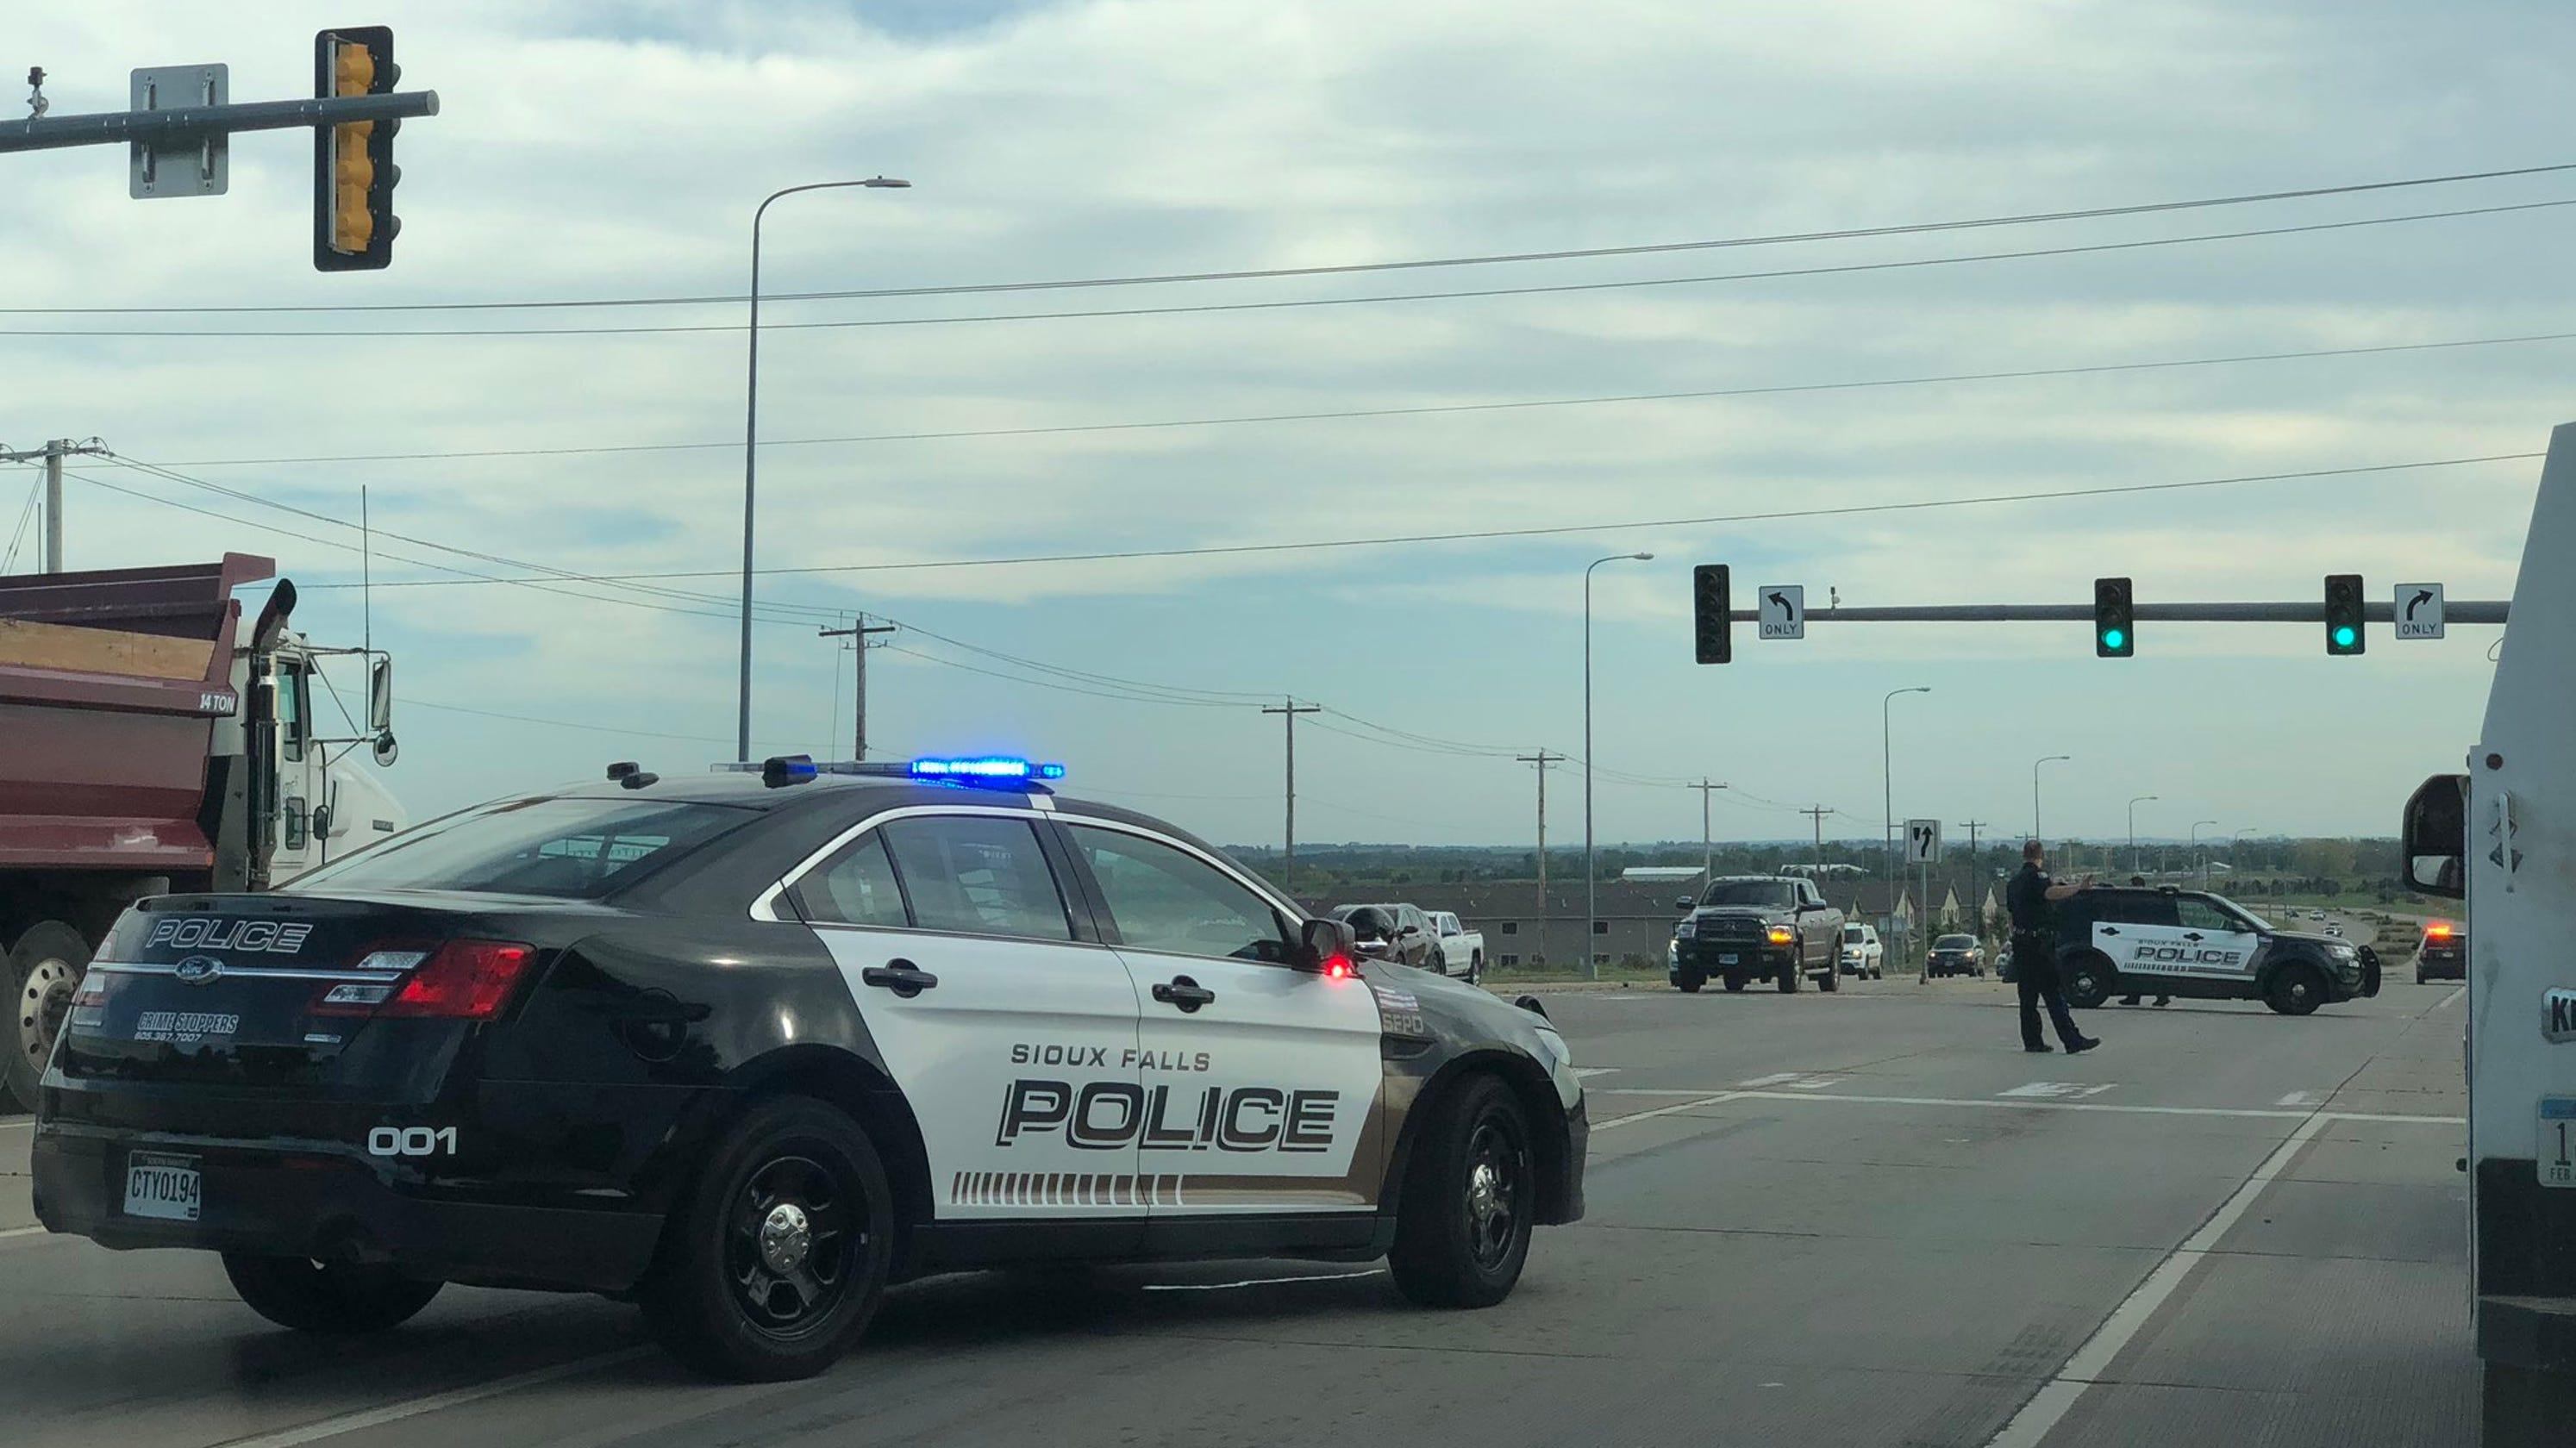 Police identify 22-year-old victim in fatal Highway 11 car crash